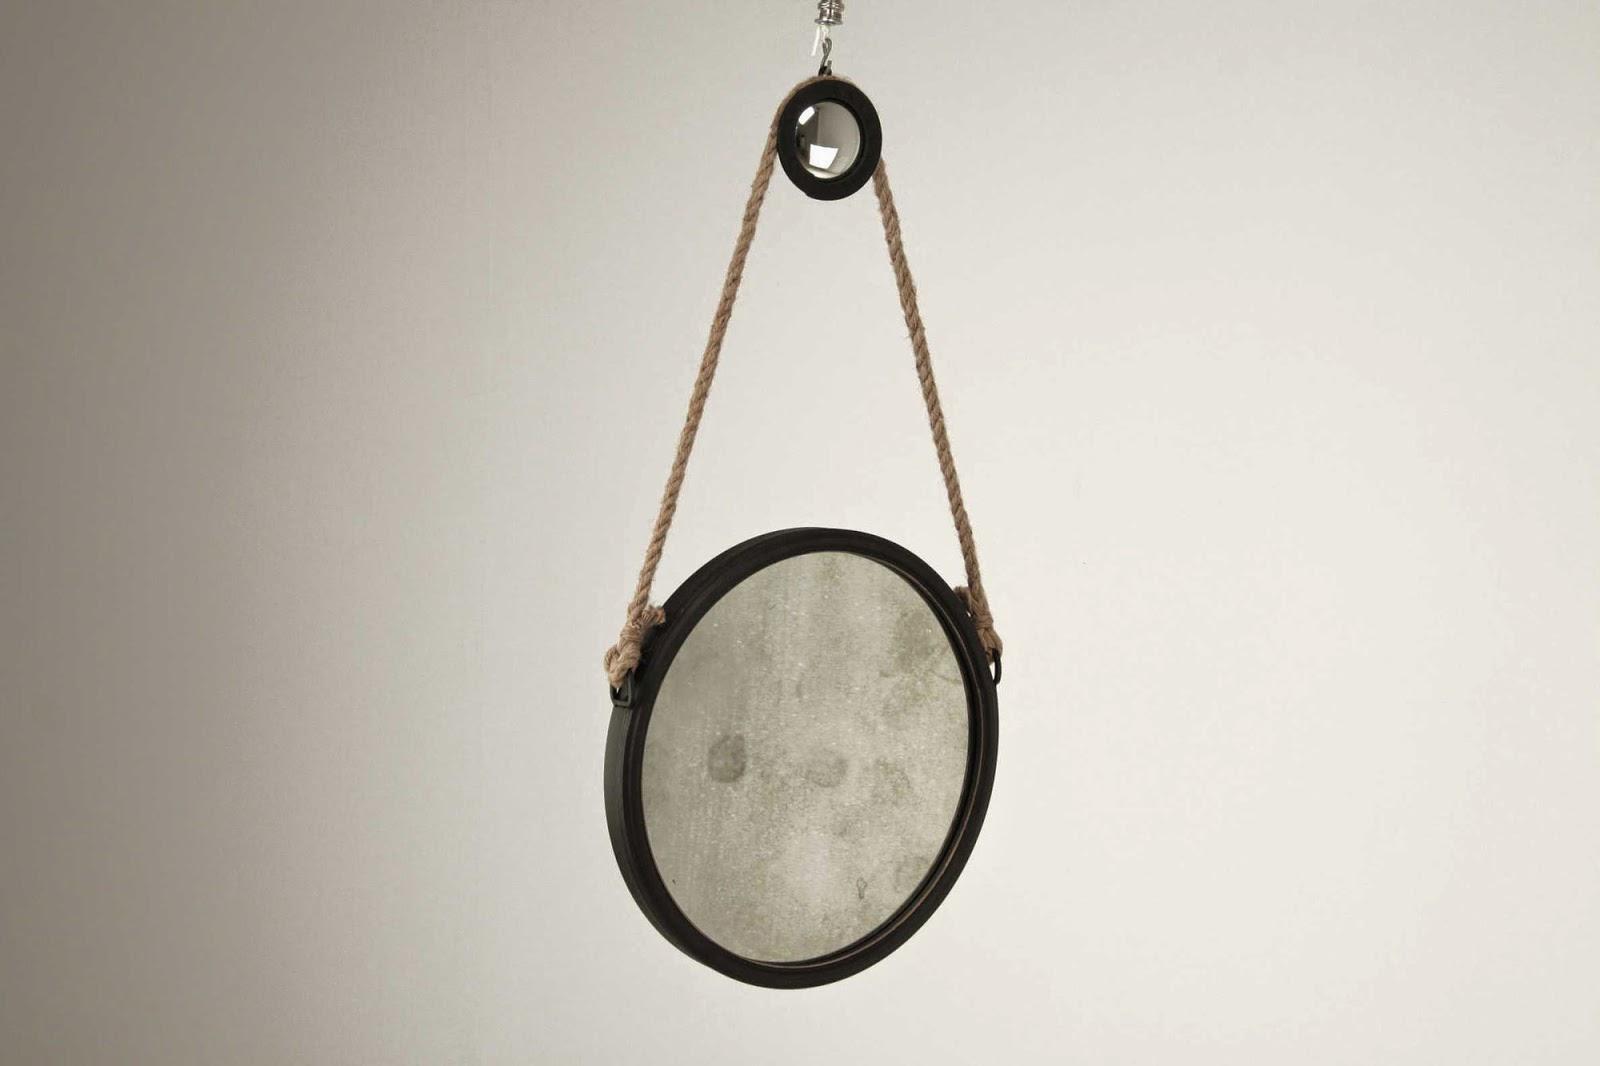 http://www.portobellostreet.es/mueble/34261/Espejo-circular-siglo-XX-peque%C3%B1o